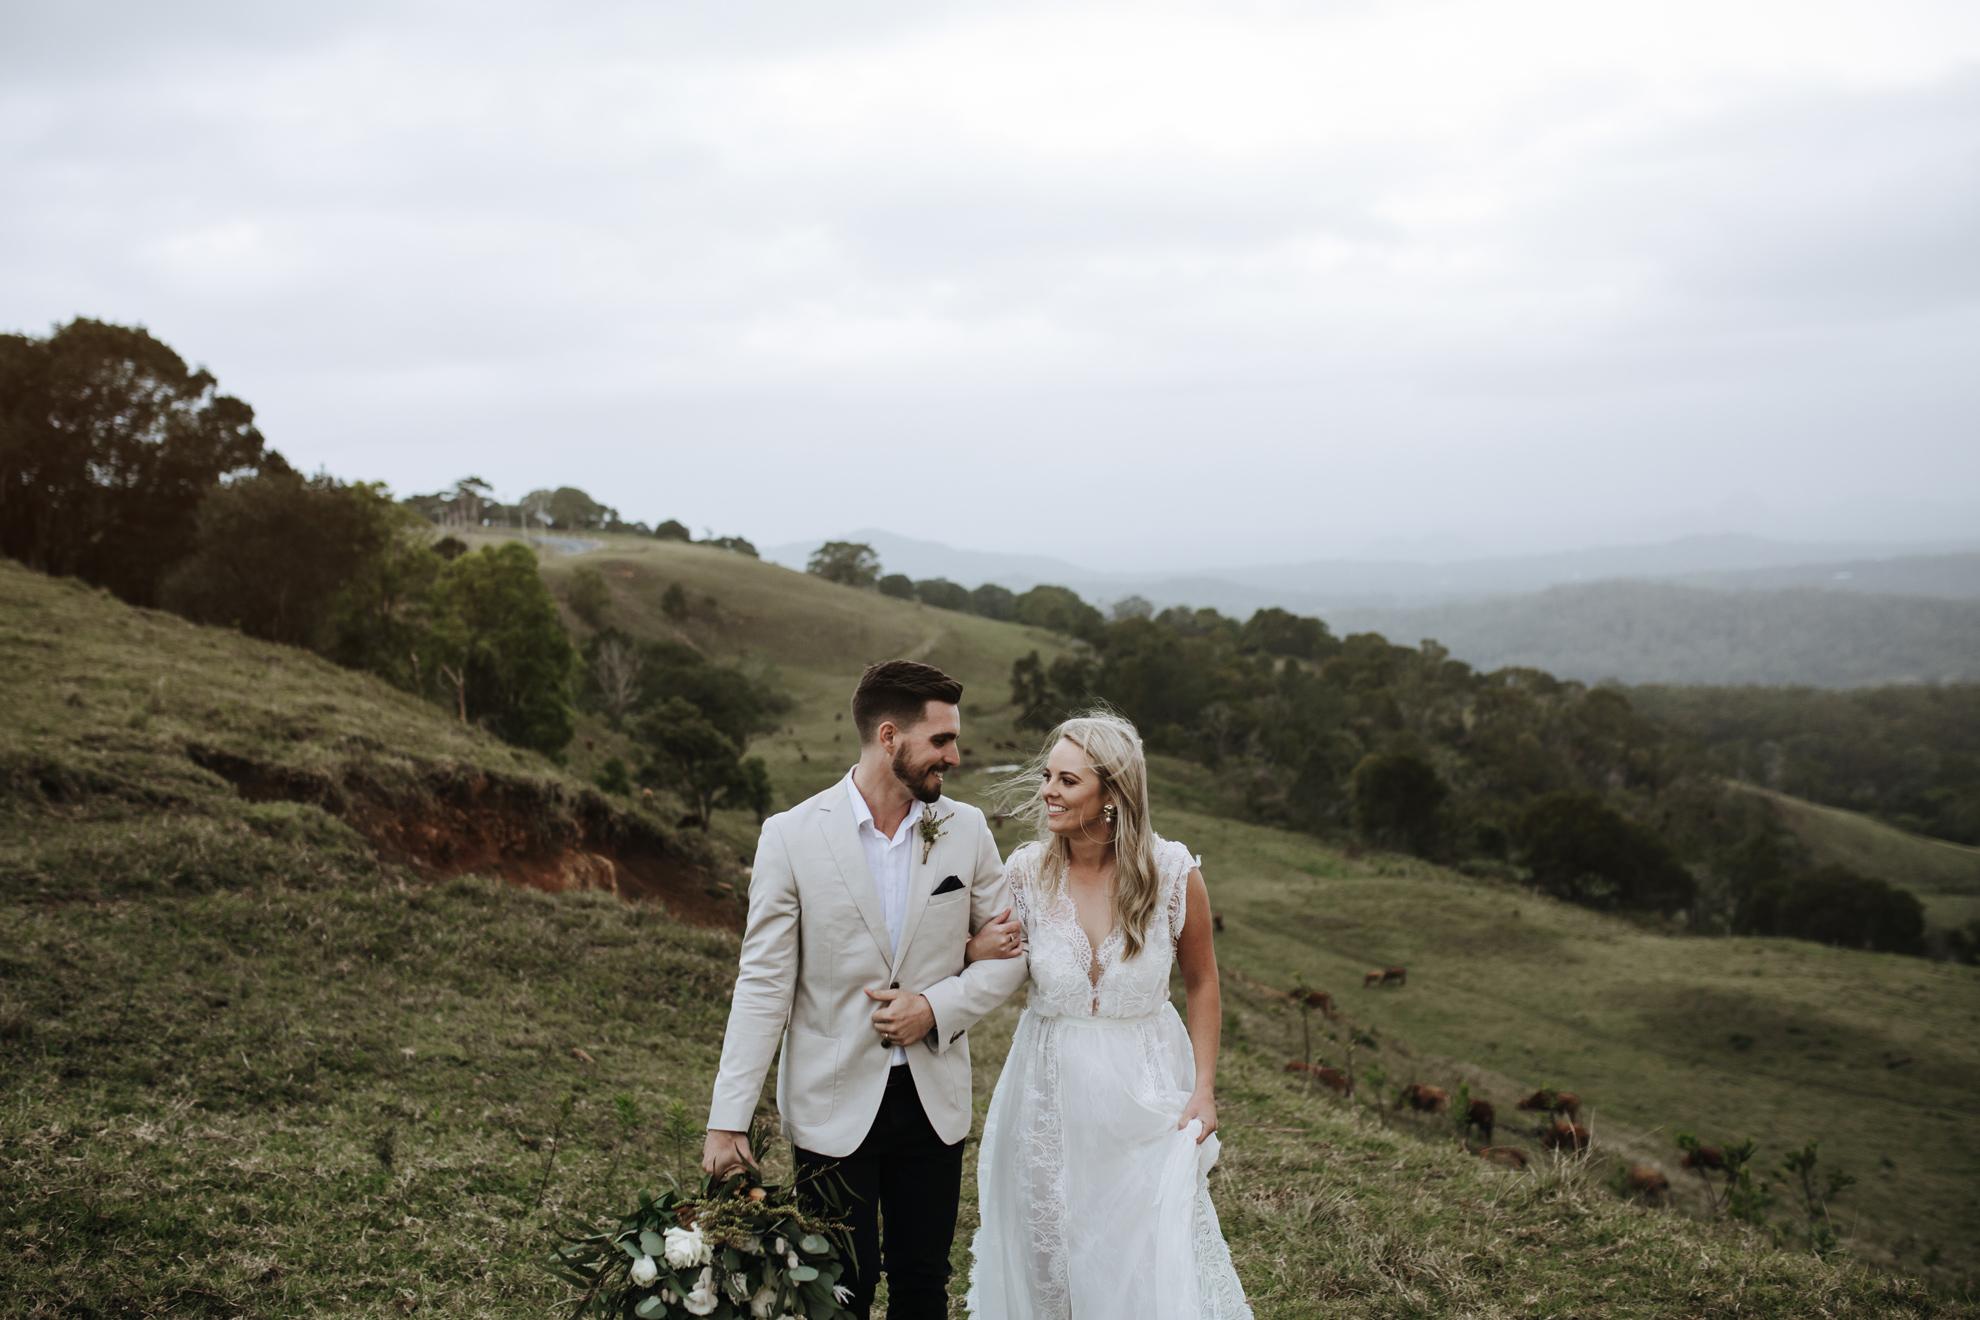 083-Kirby_Lewis_Maleny_Manor_Wedding.jpg